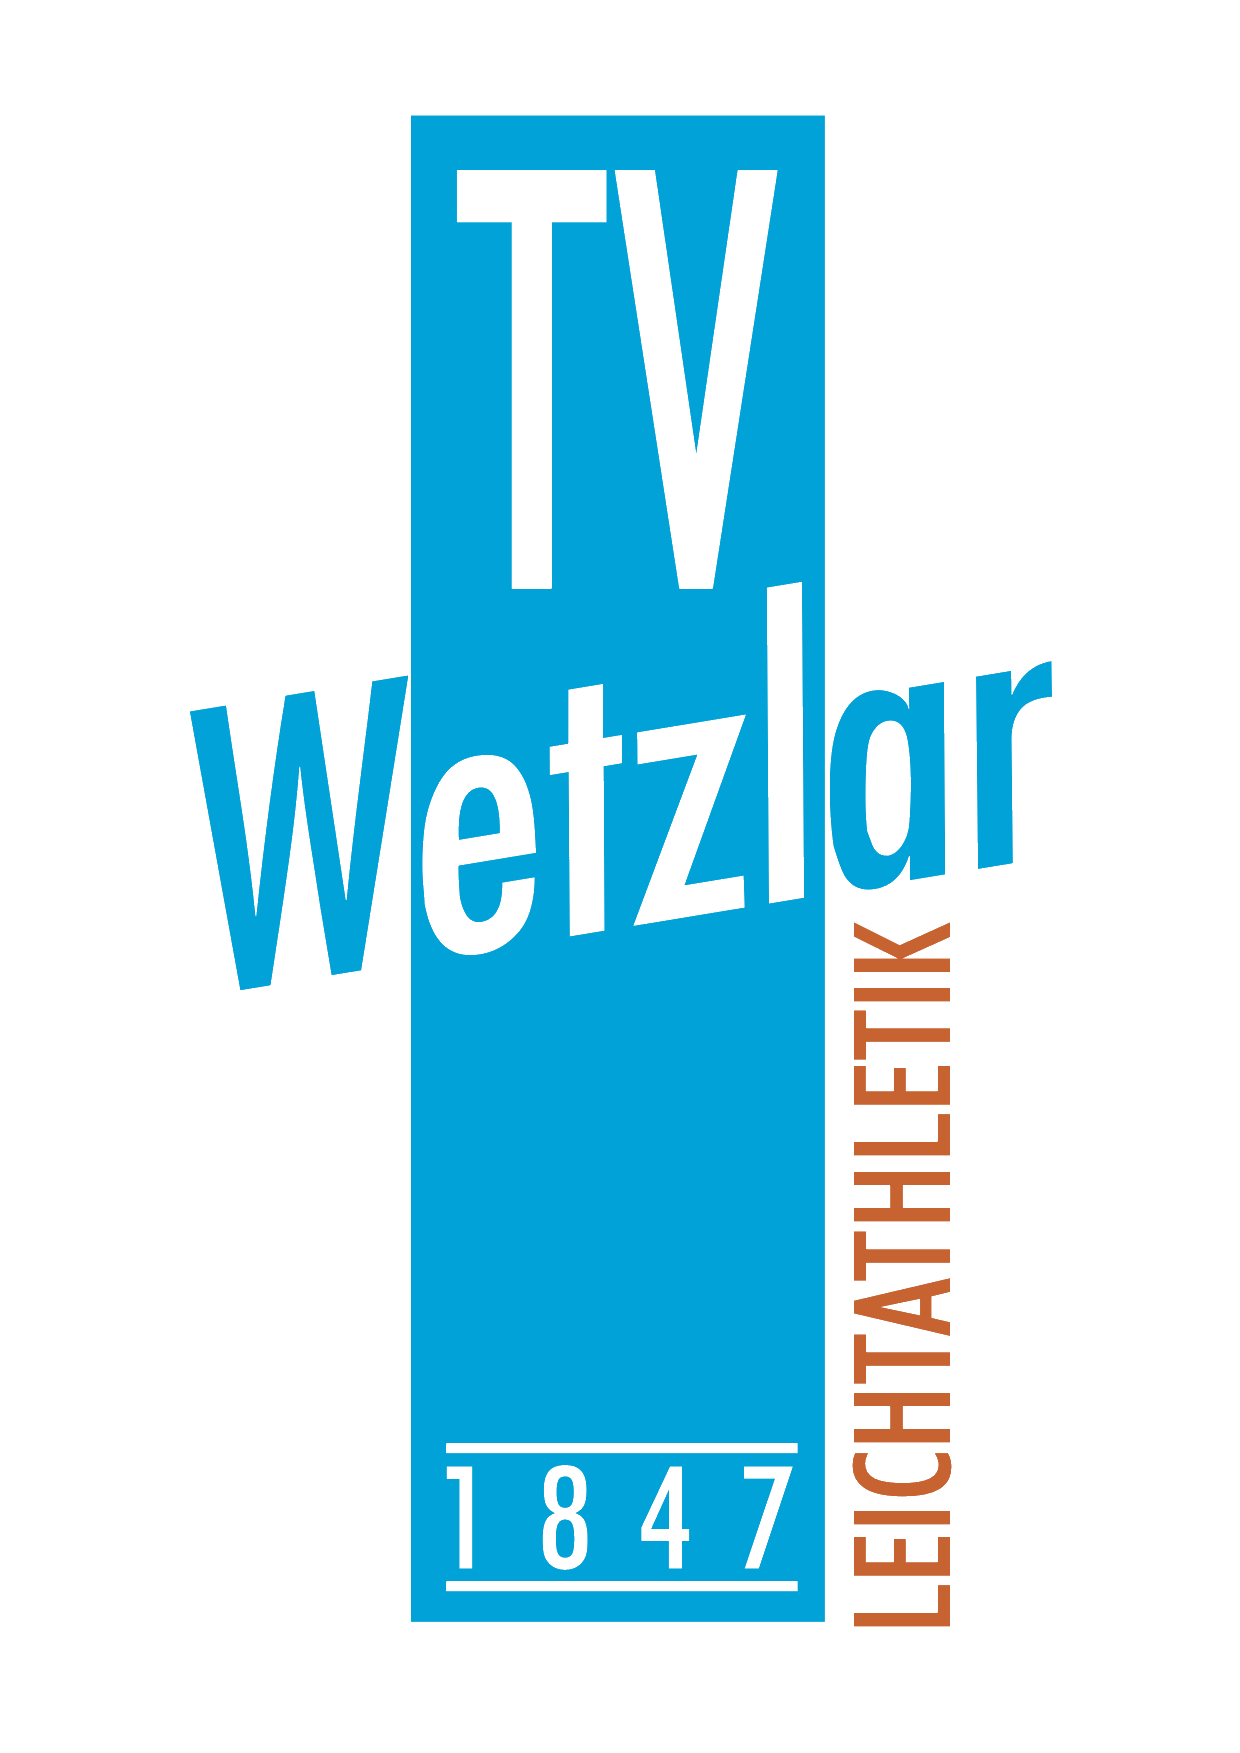 TV Wetzlar-Leichtathletik